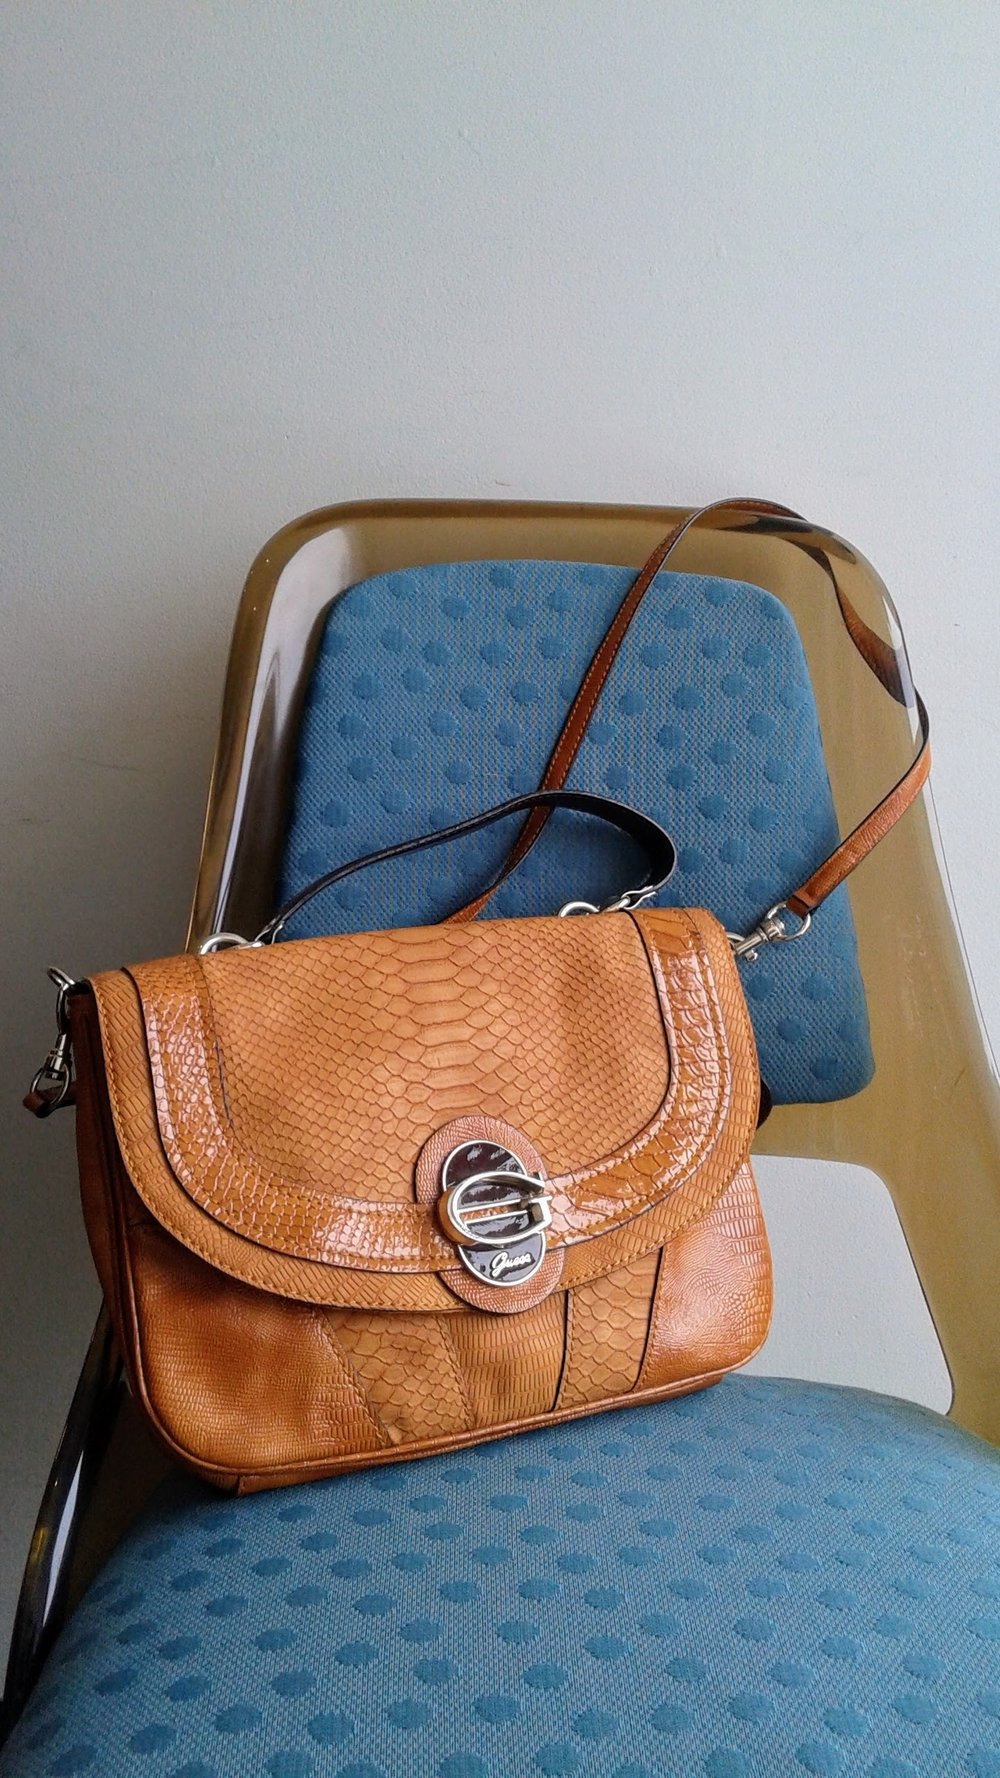 Guess purse; $26